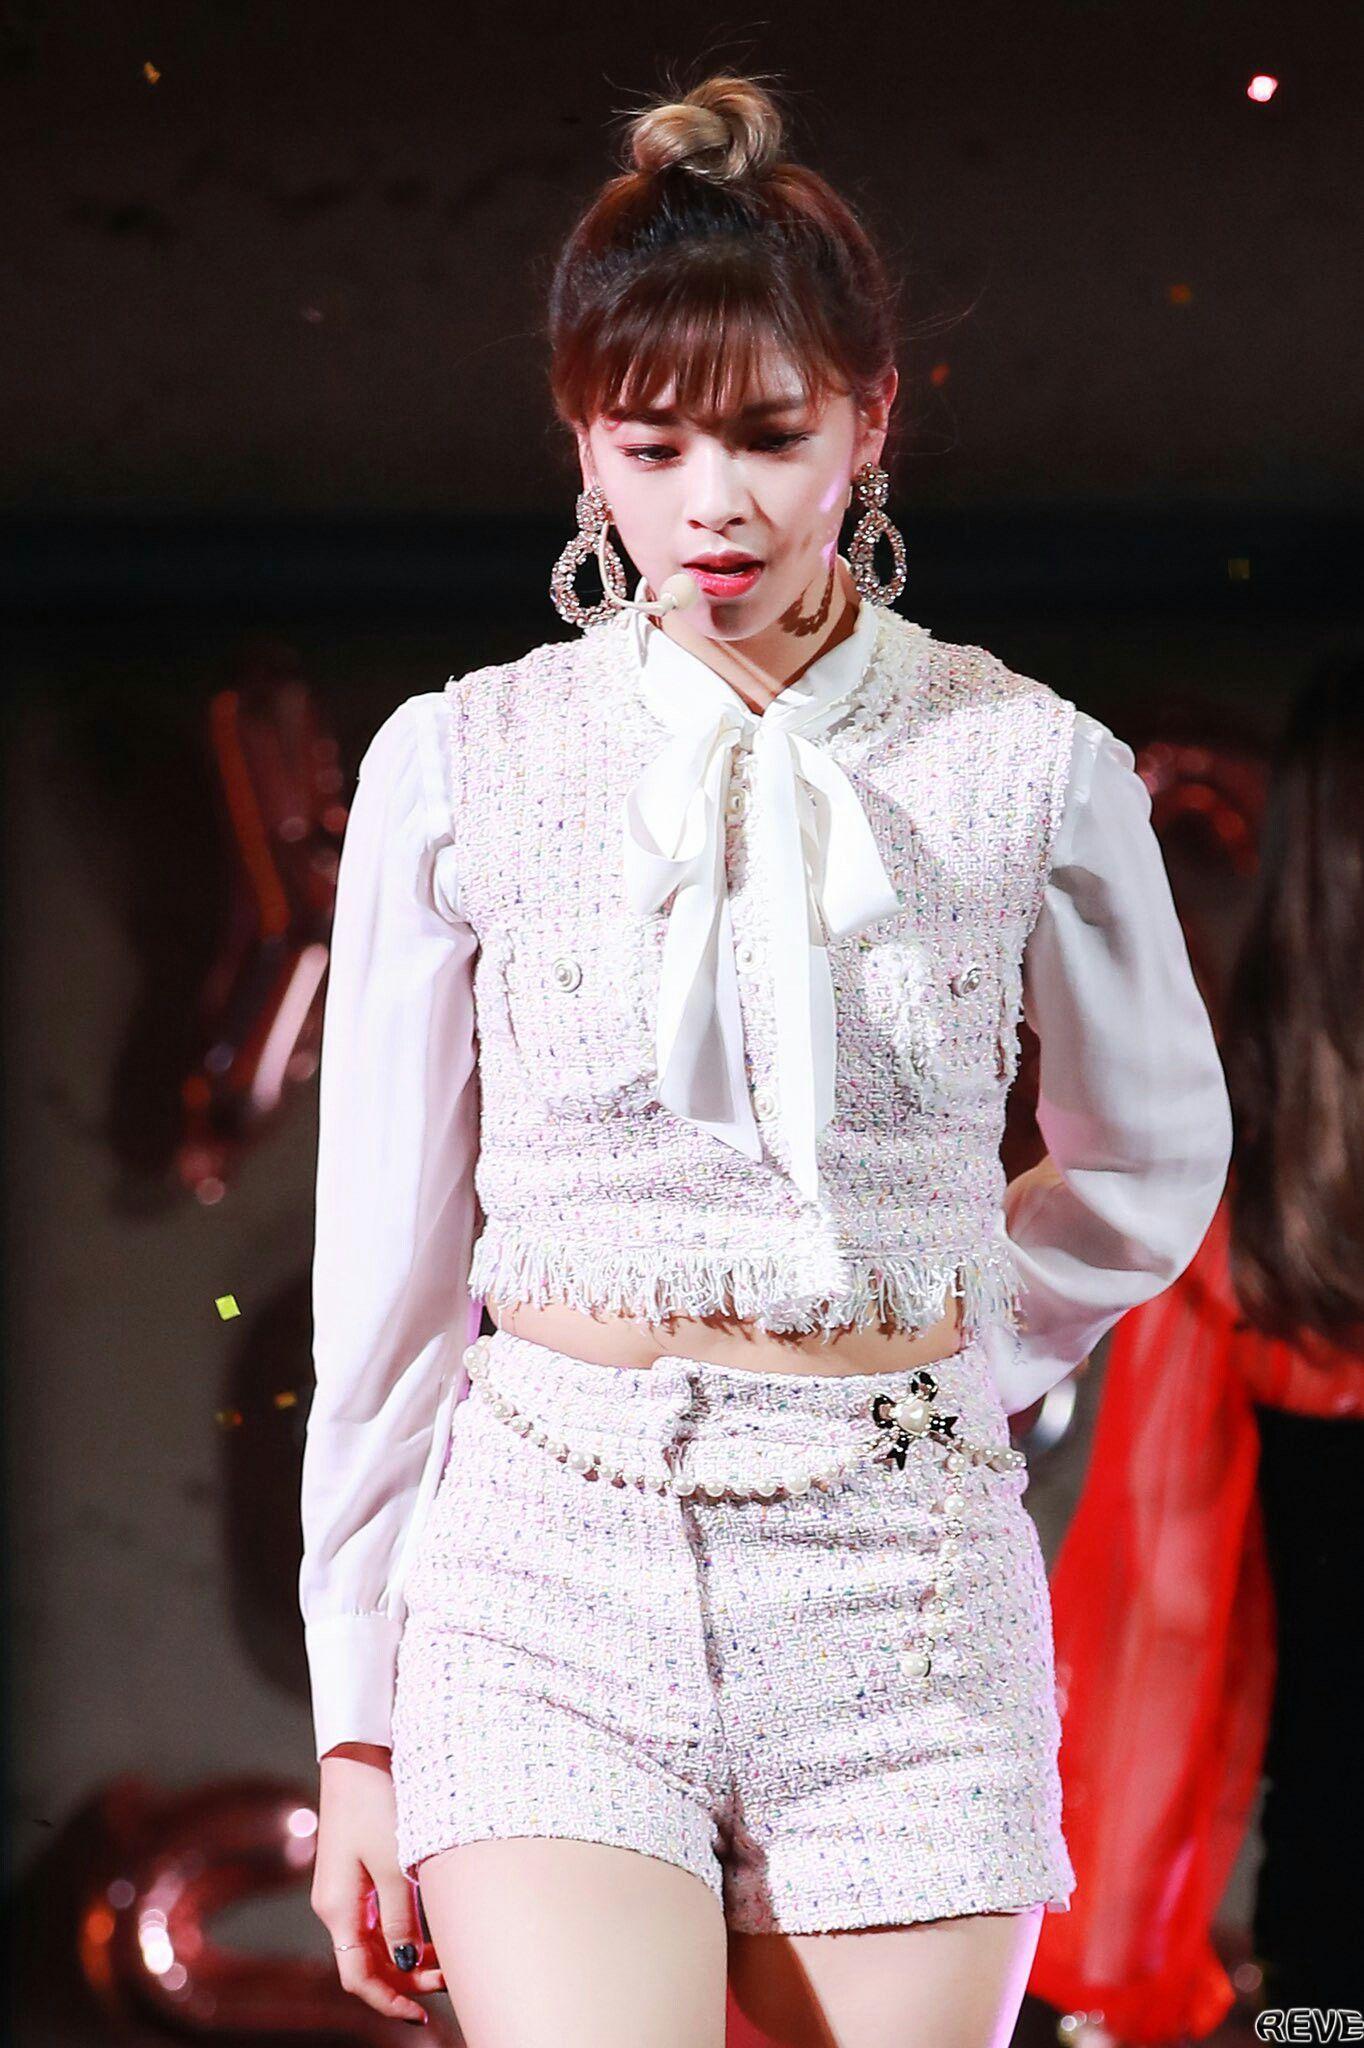 80s wedding decorations november 2018 SHOWCASE YES or YES    JEONGYEON유정연 in